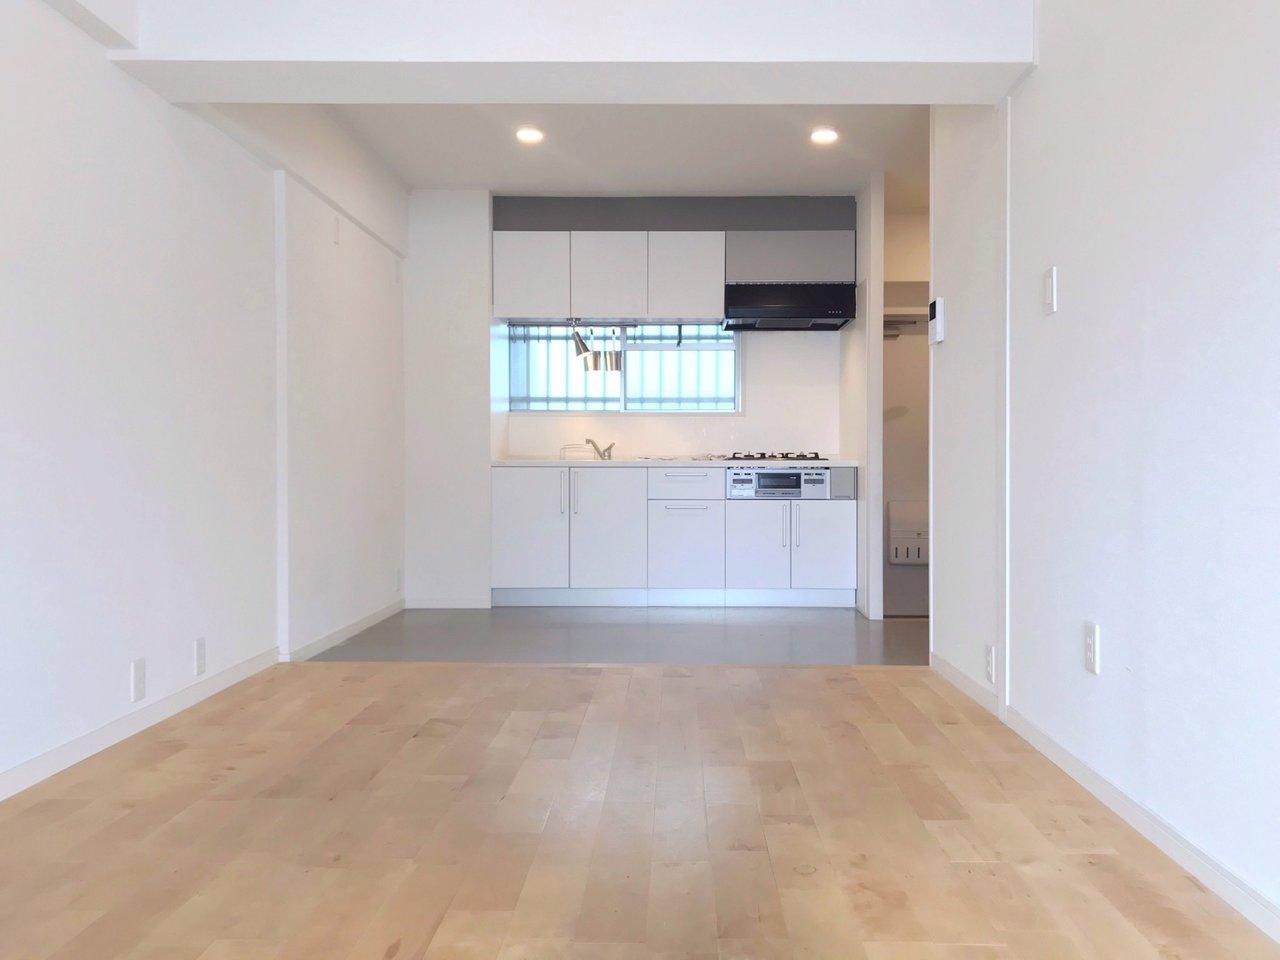 LDKはこんな感じ。キッチン前は土間に、リビング部分は無垢床になっているんです。メリハリがきいてかっこいい。